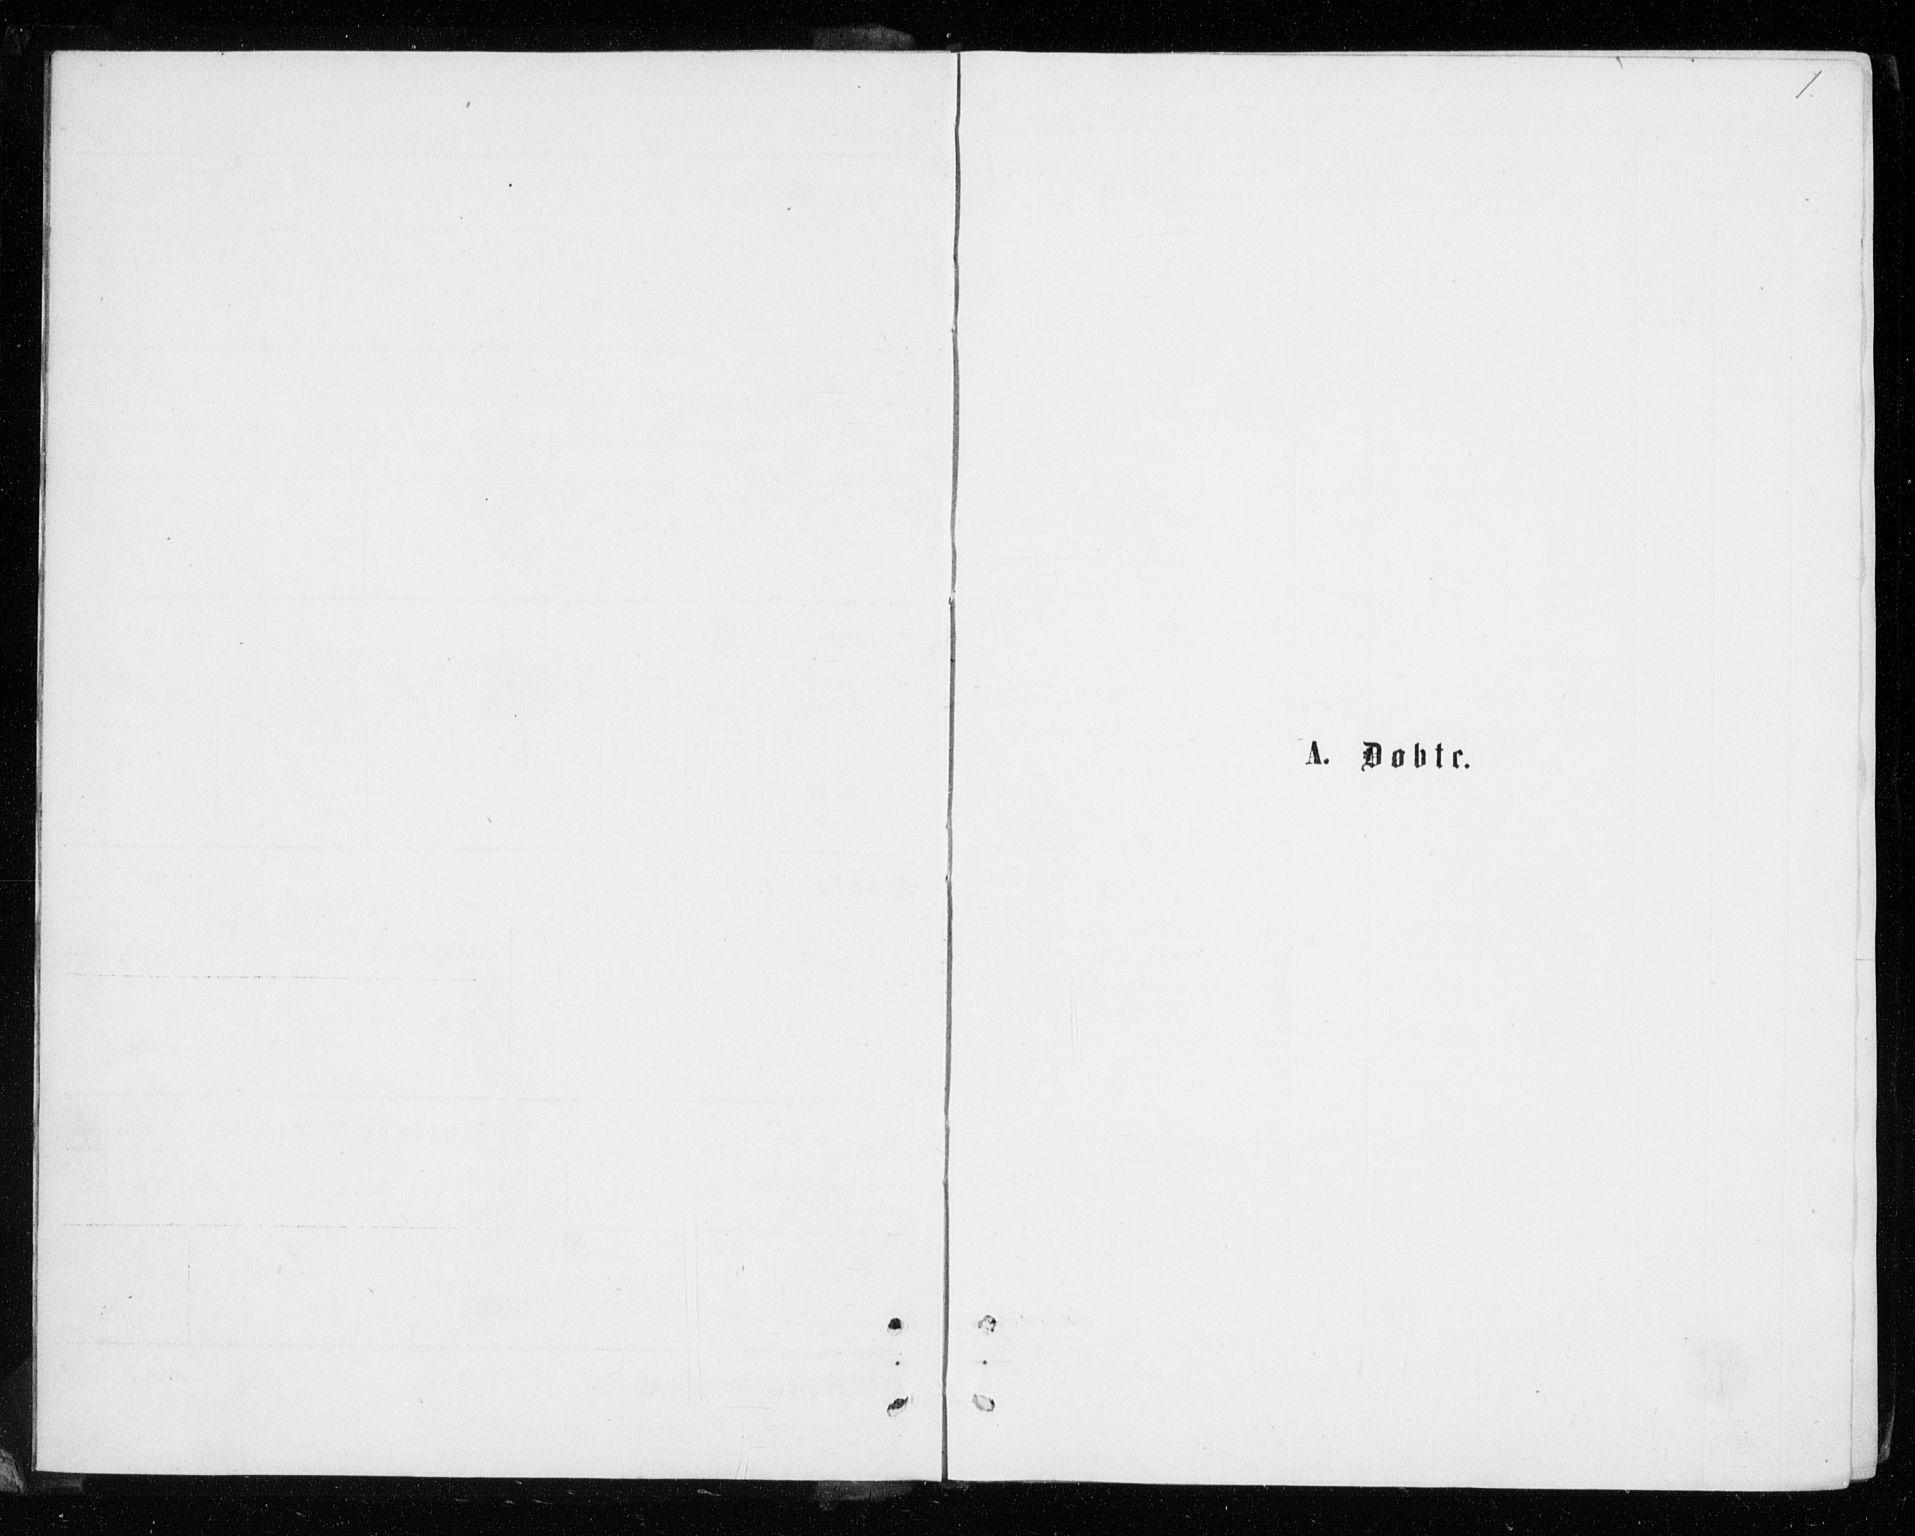 SATØ, Tromsø sokneprestkontor/stiftsprosti/domprosti, G/Gb/L0008klokker: Klokkerbok nr. 8, 1875-1879, s. 1